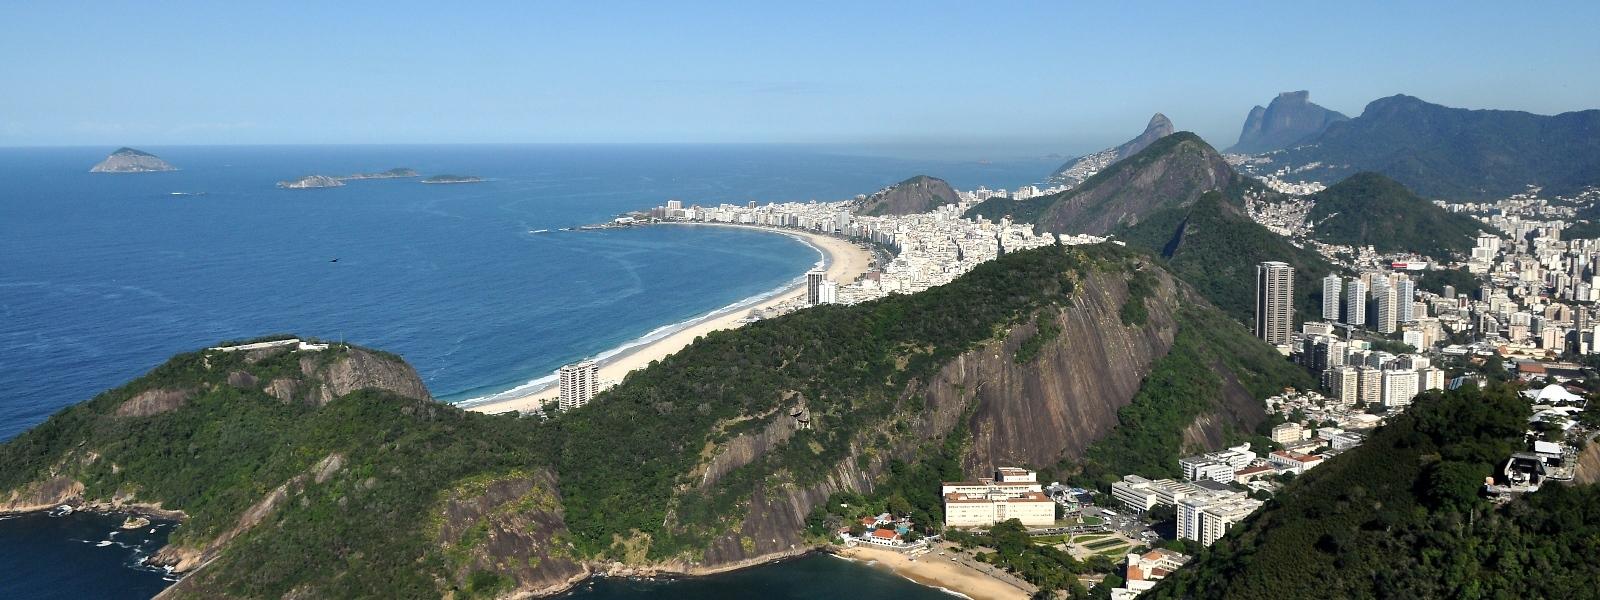 Vista Copacabana